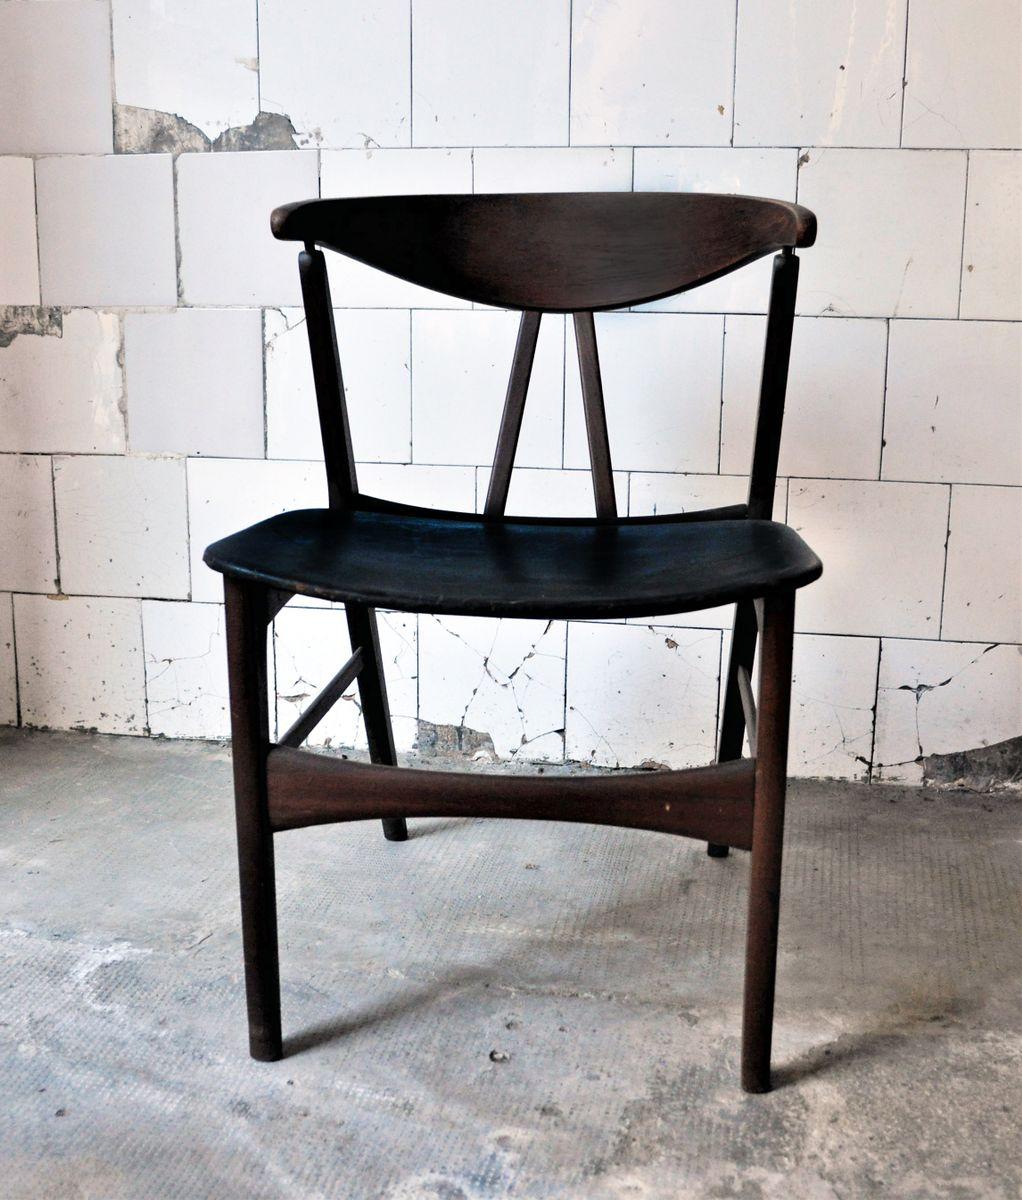 d nische vintage st hle 4er set bei pamono kaufen On stühle 4er set